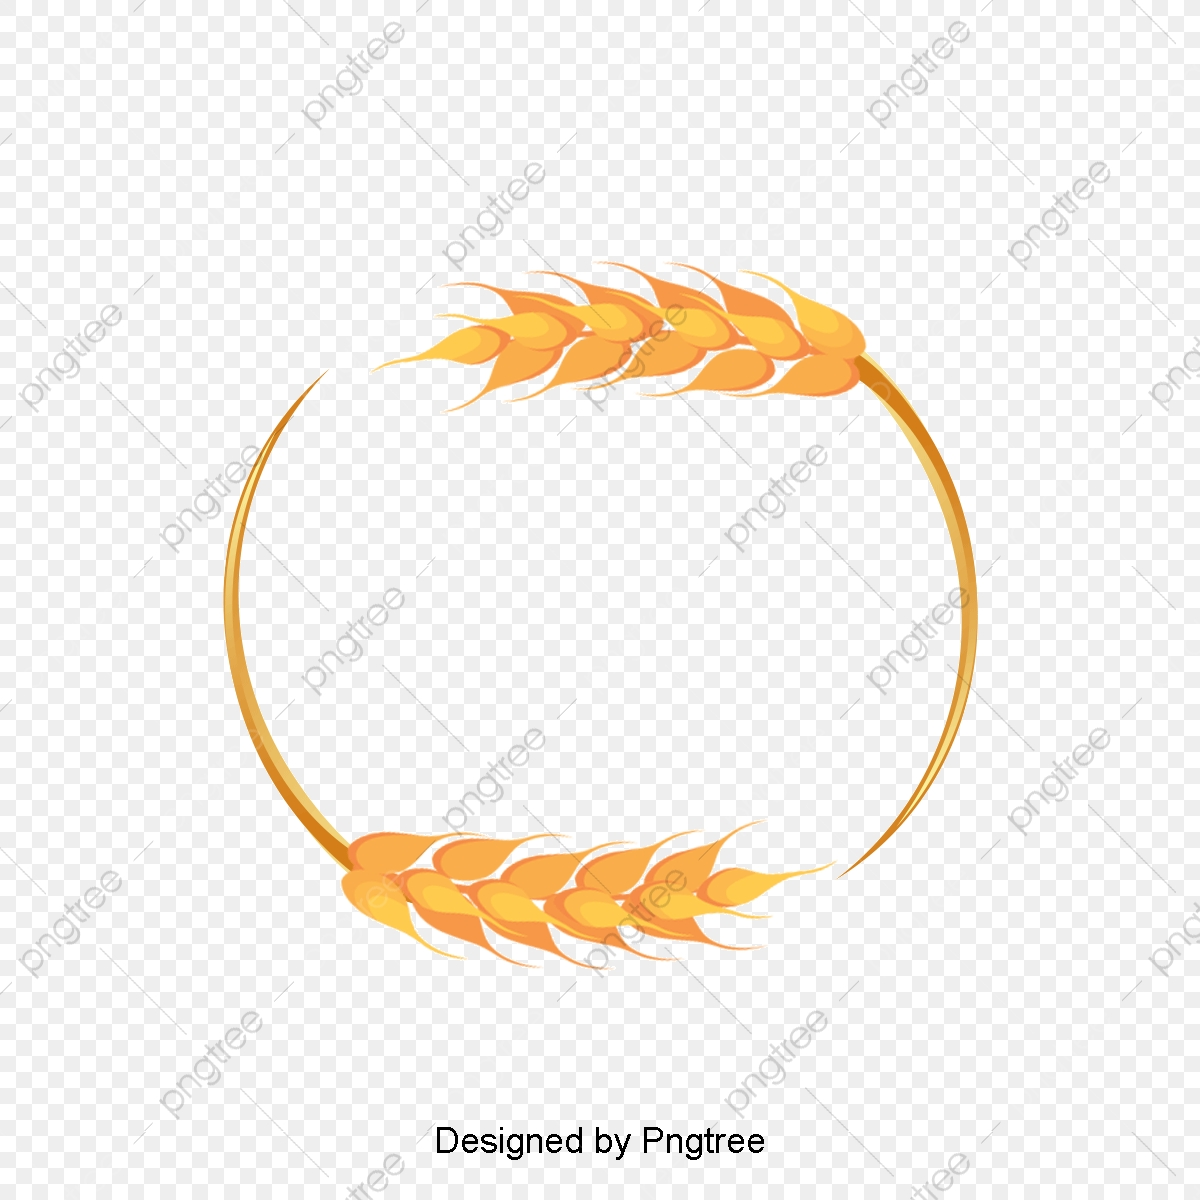 Wheat clipart banner. Beautiful border frame vector